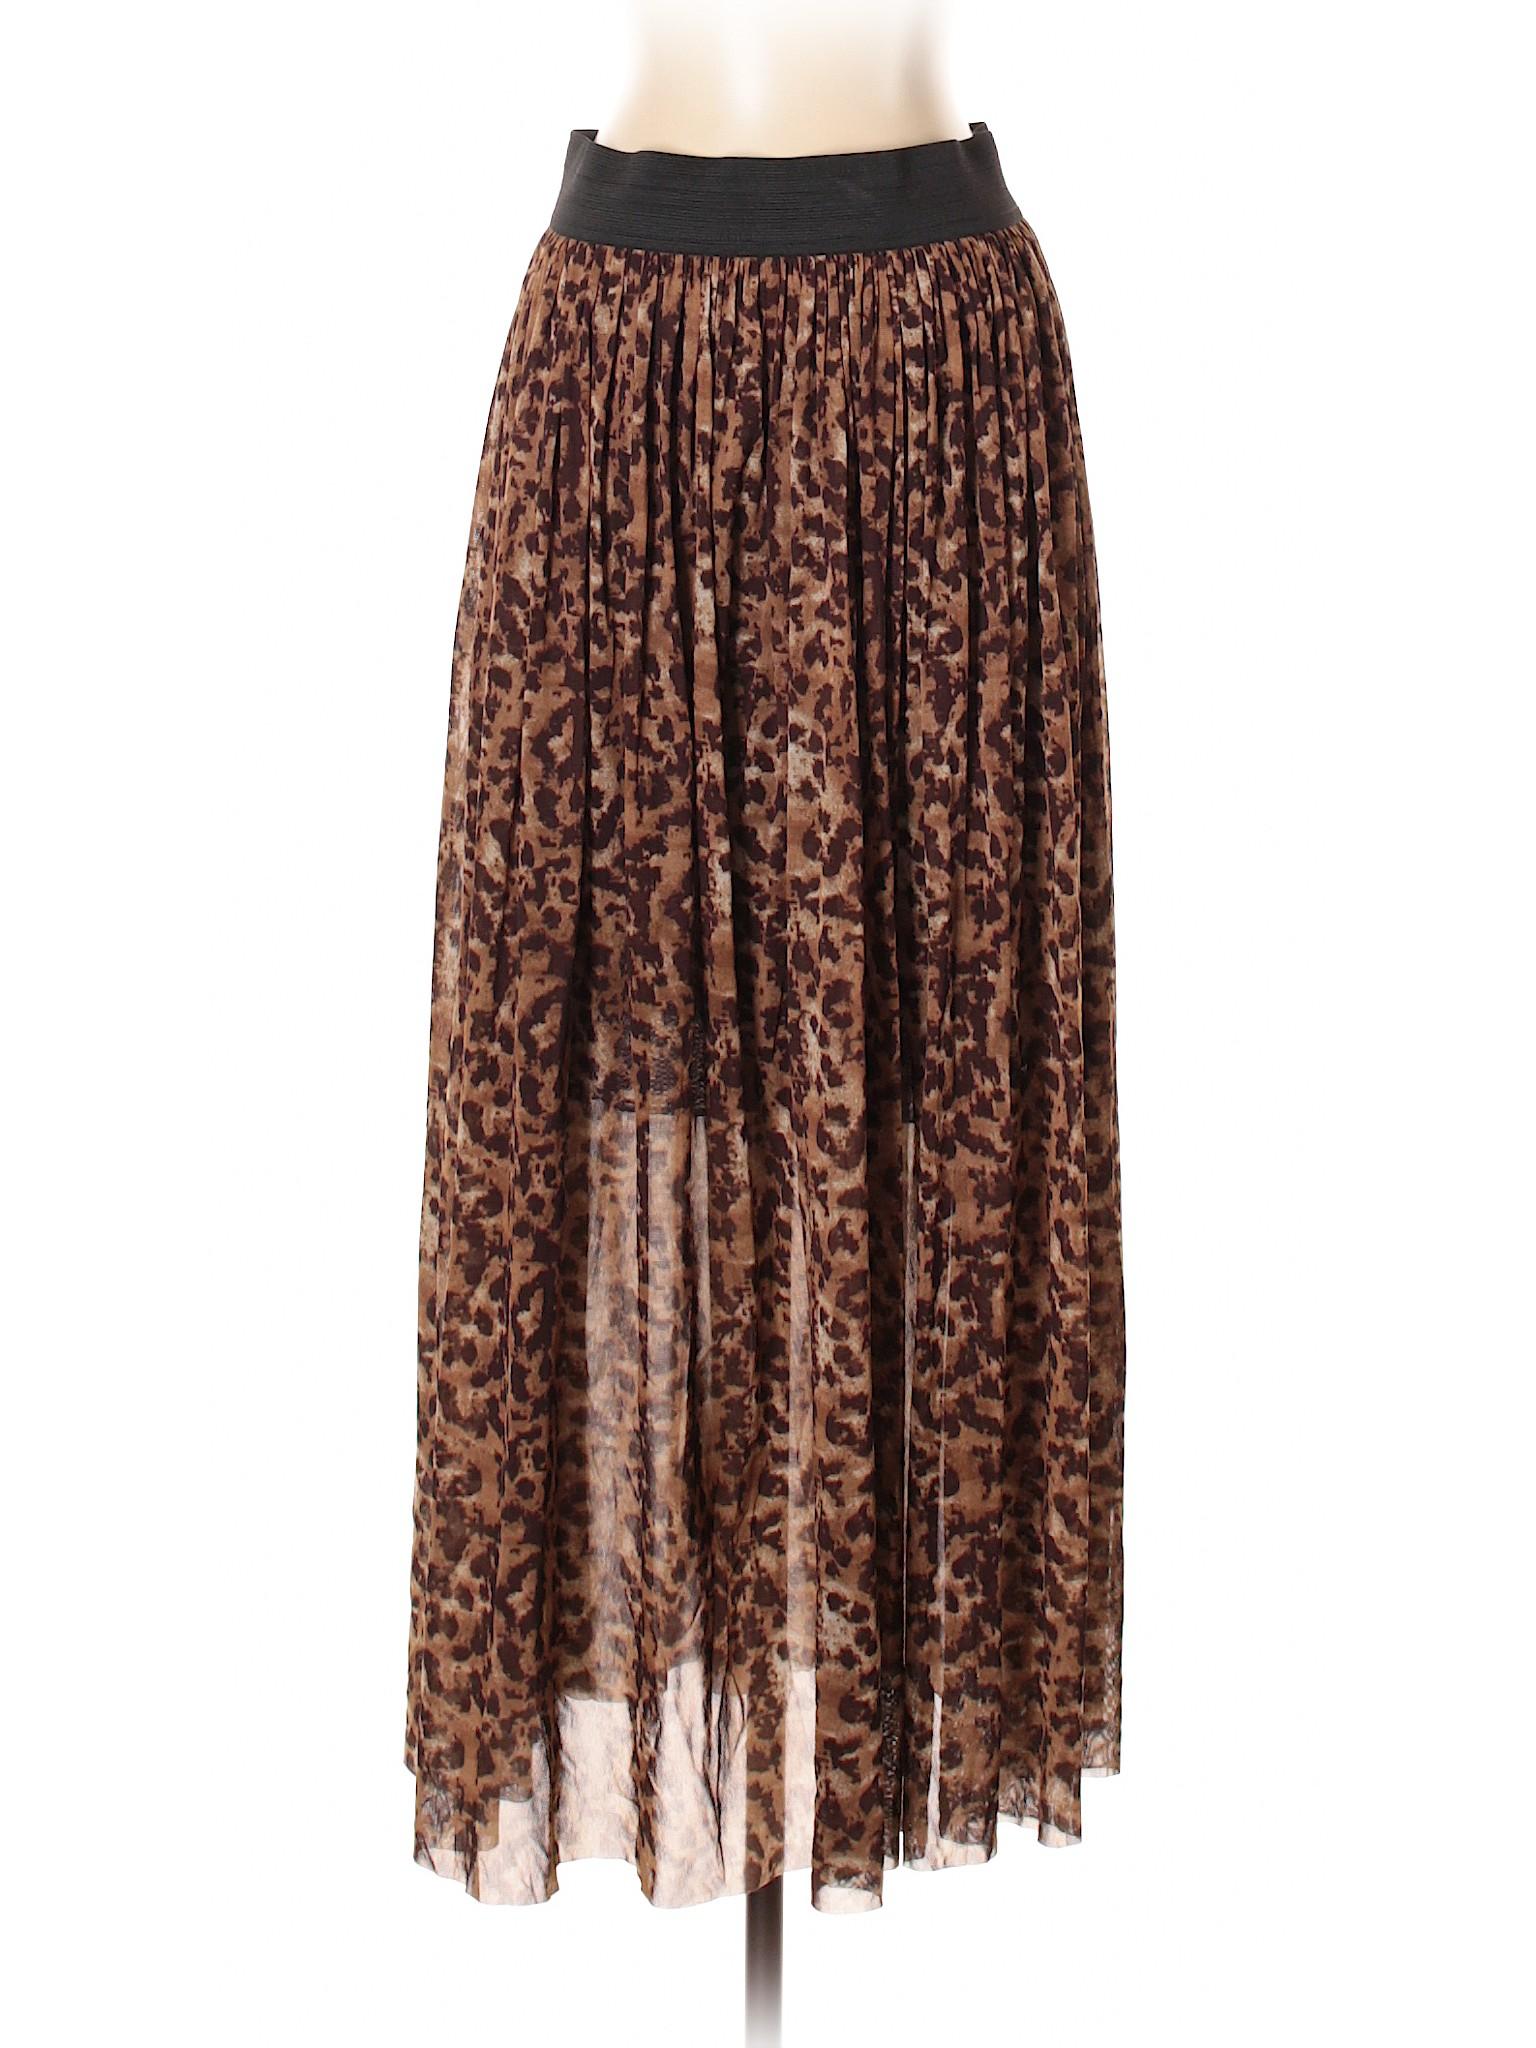 Boutique Boutique Boutique Casual Boutique Casual Skirt Skirt Casual Boutique Skirt Skirt Skirt Boutique Skirt Casual Casual Casual Av6ArTq